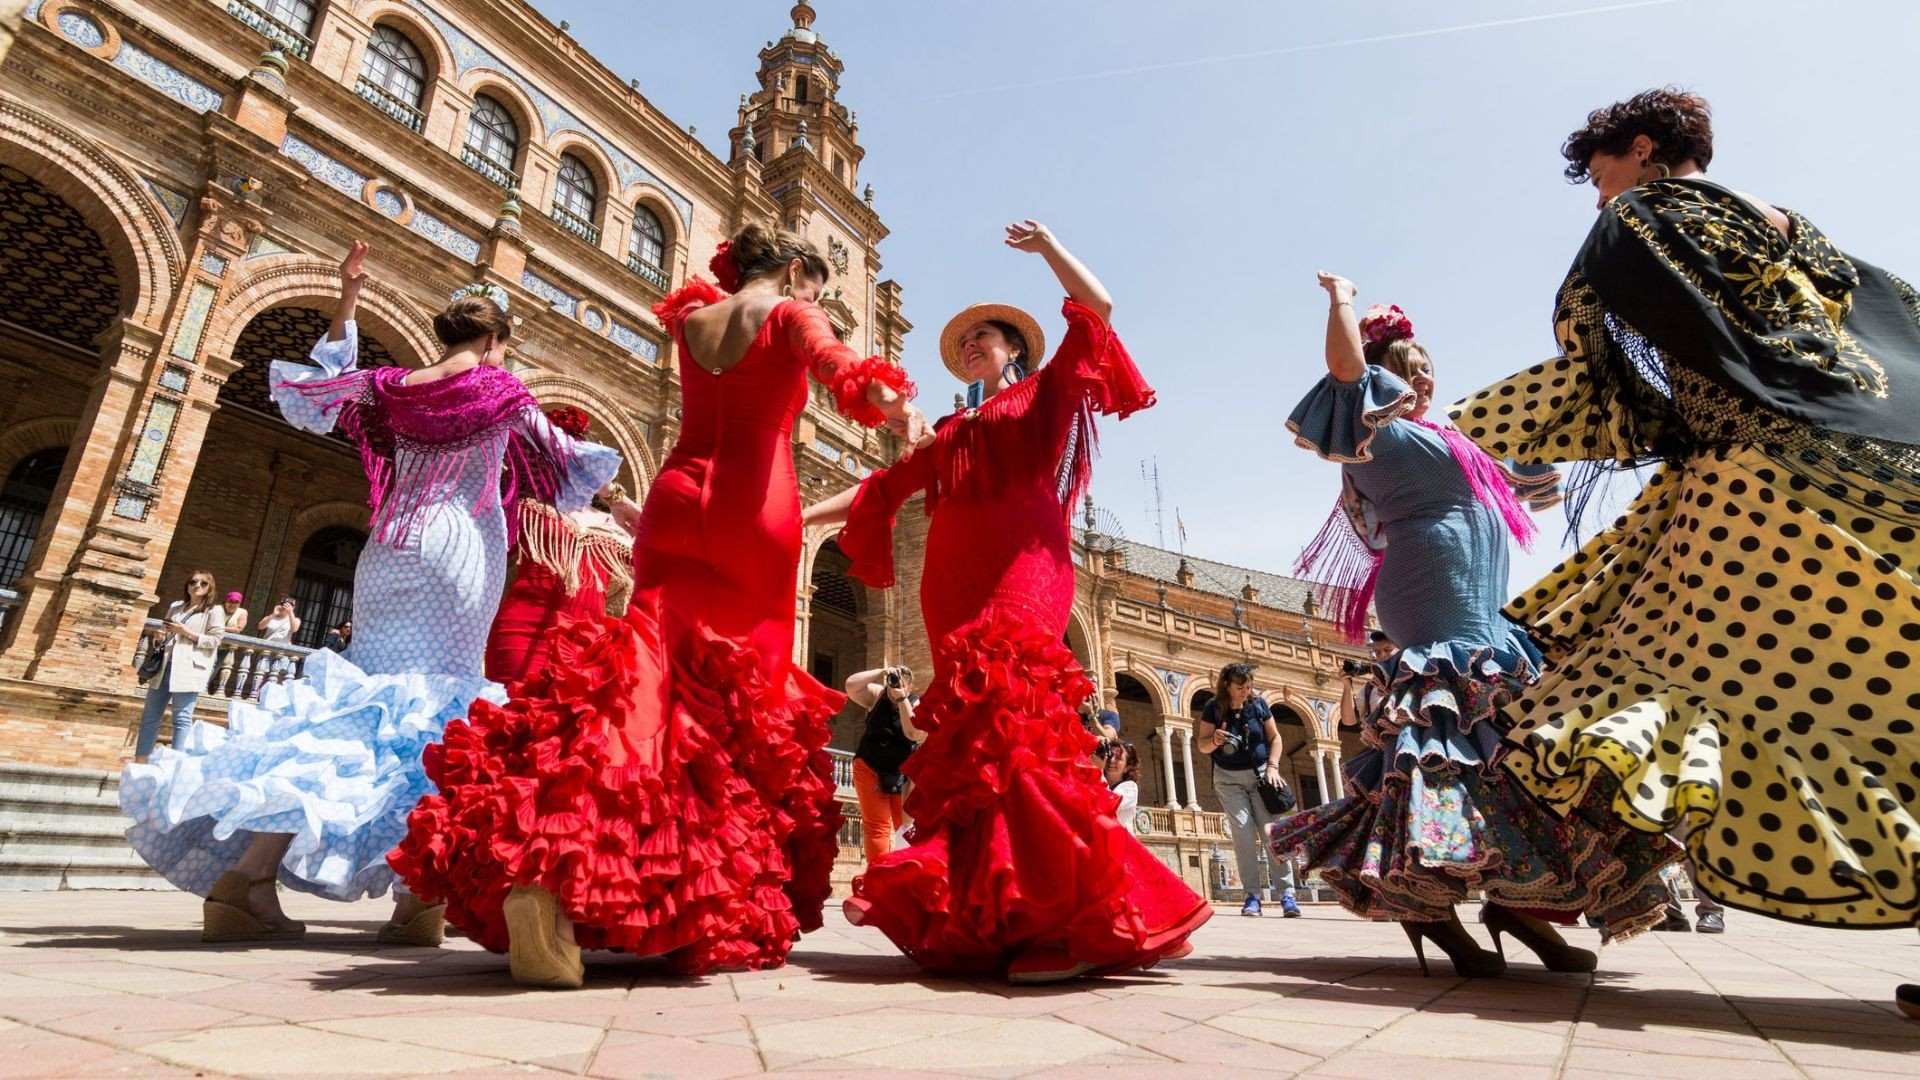 Escuelas De Baile En Alcalá De Henares Academia Belén Rodríguez